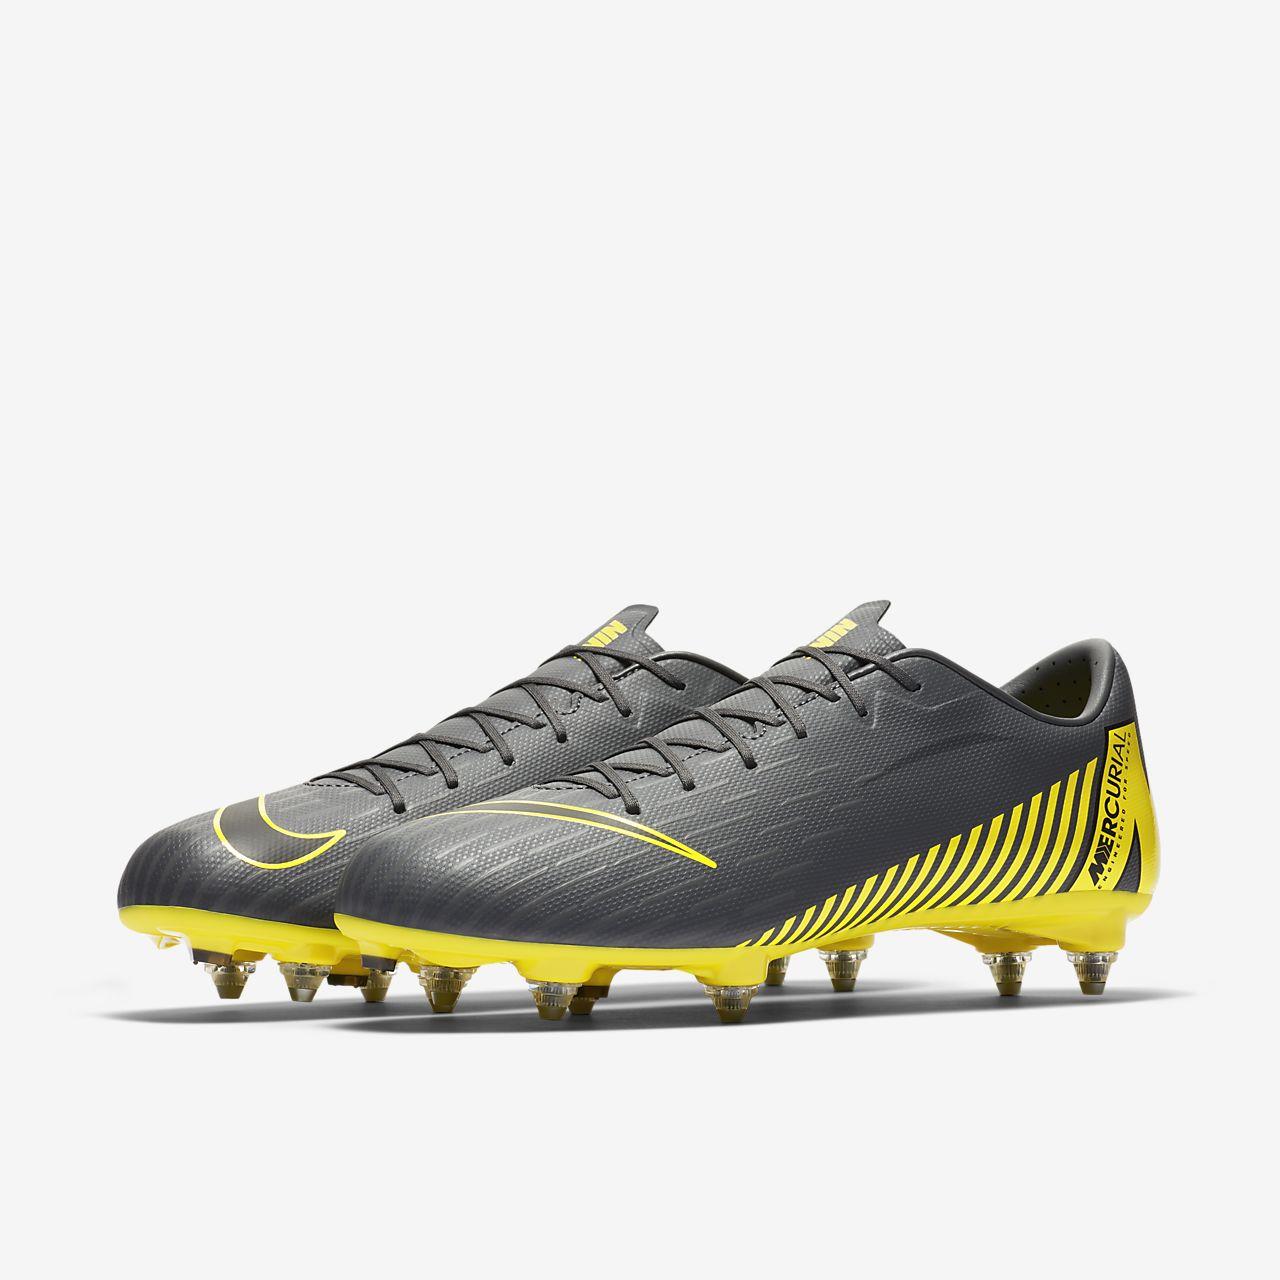 c2523b6d5de Nike Mercurial Vapor XII Academy SG-PRO Soft-Ground Football Boot ...